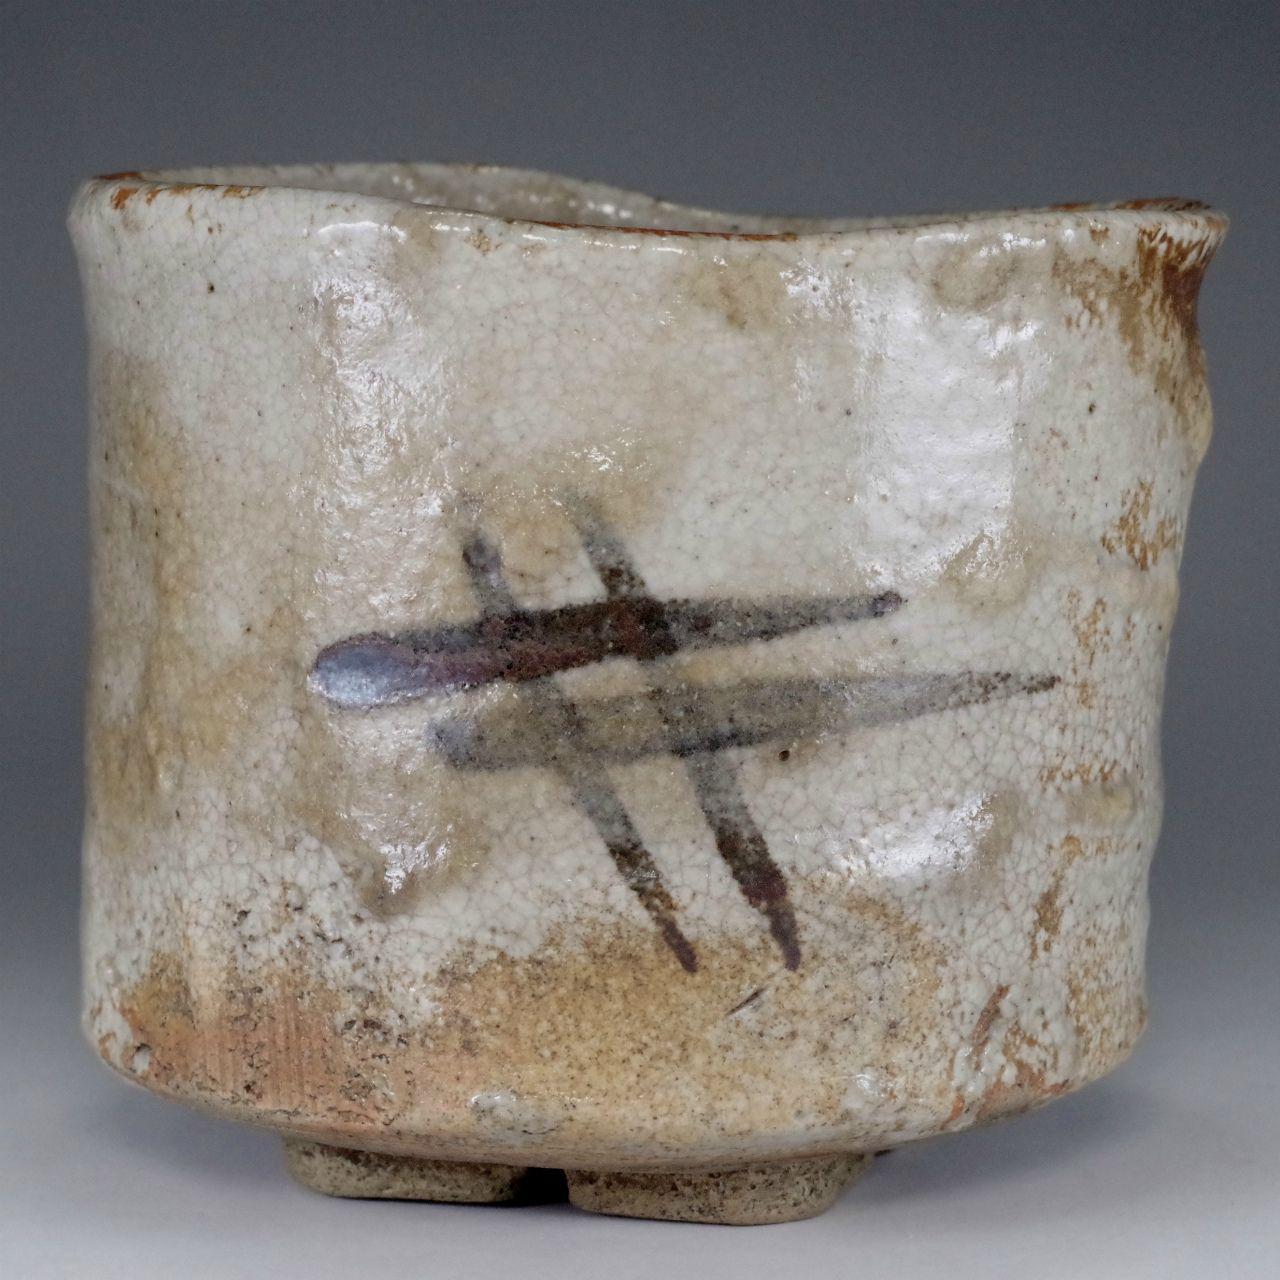 E Shino Chawan Antique Japanese Pottery Bowl By Hirasawa